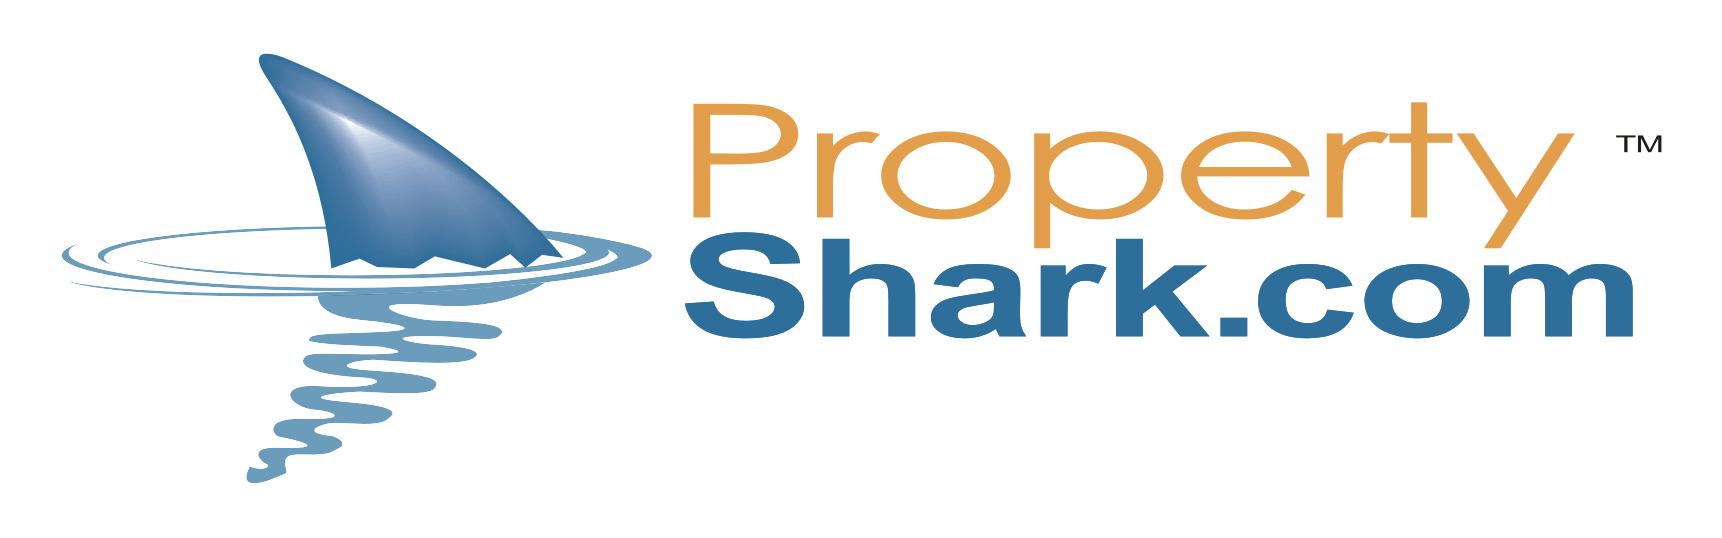 Property Shark